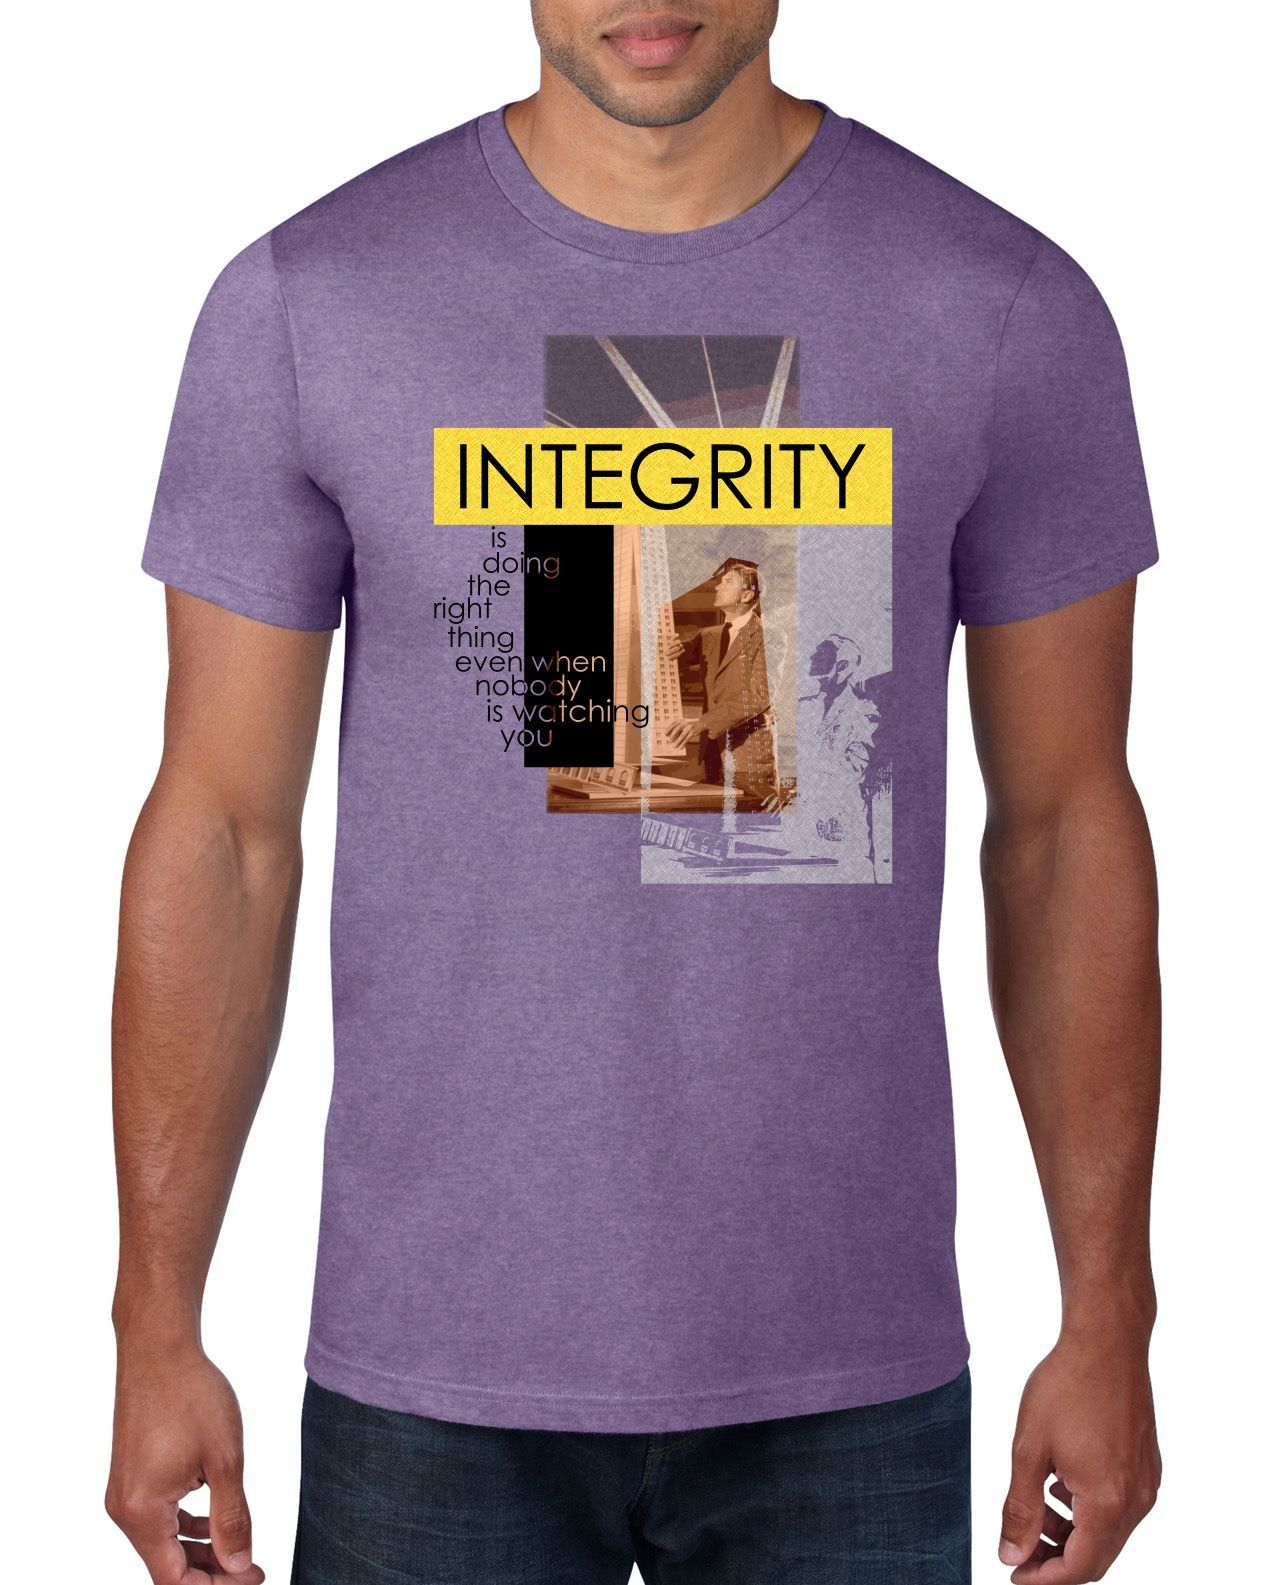 Integrity - Men's short sleeve t-shirt